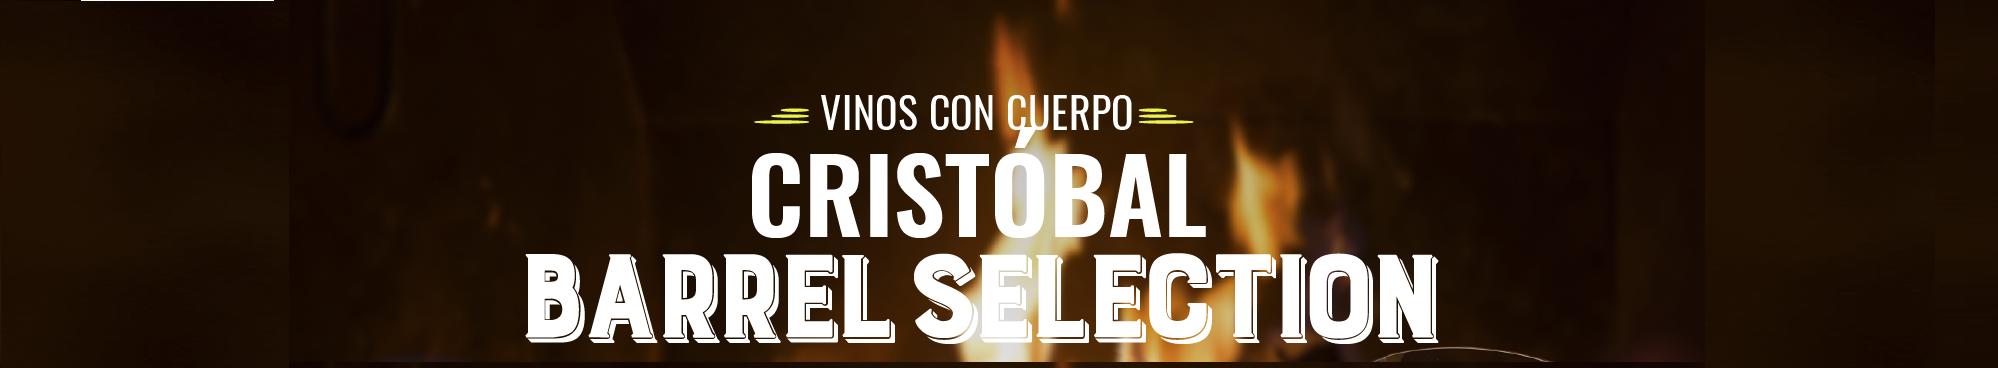 Bodega Don Cristóbal